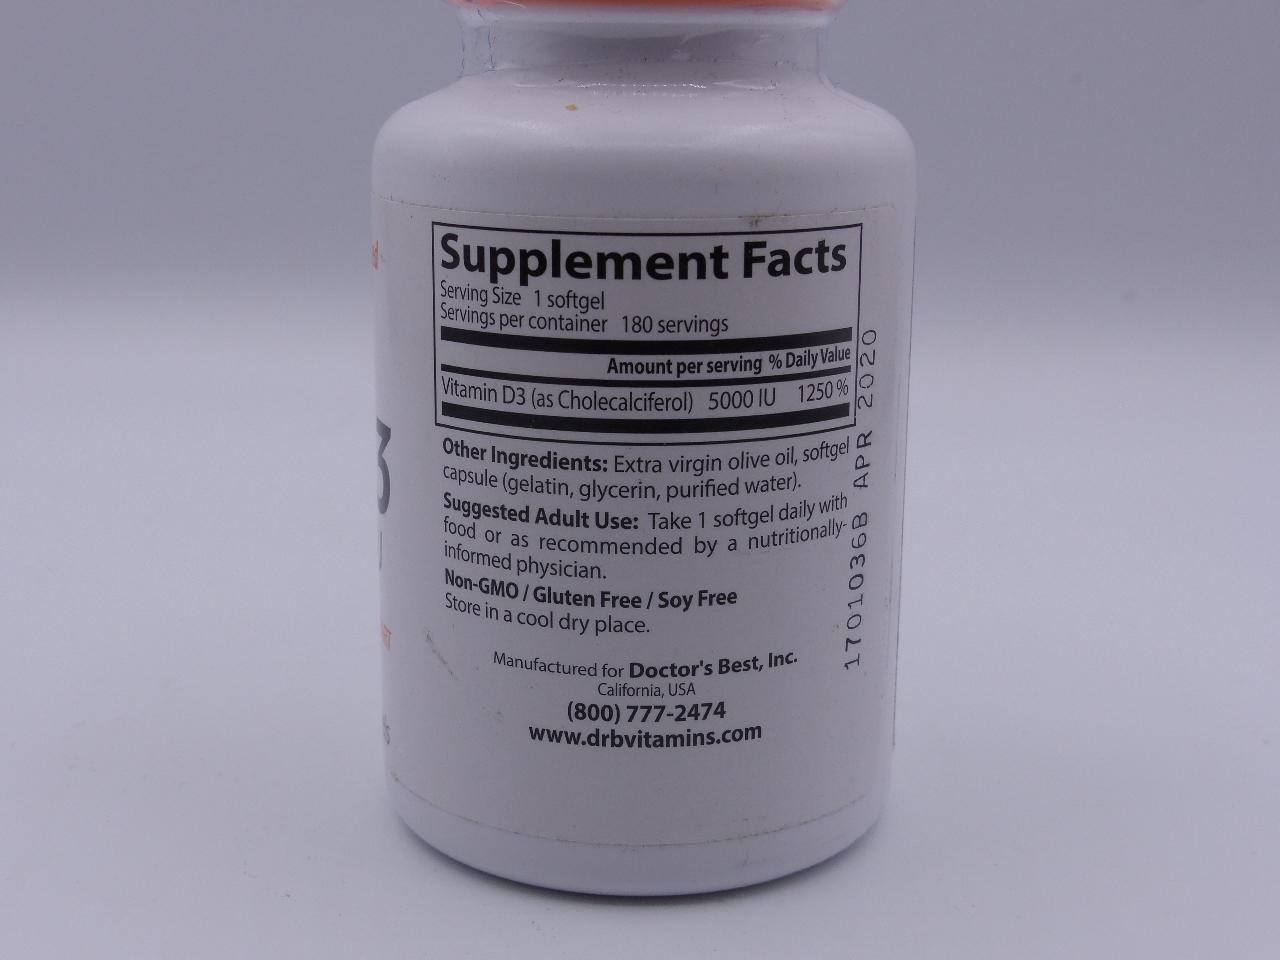 Best Vitamin D3 Supplement 2020 DOCTORS BEST VITAMIN D3 4/2020 | MDG Sales, LLC